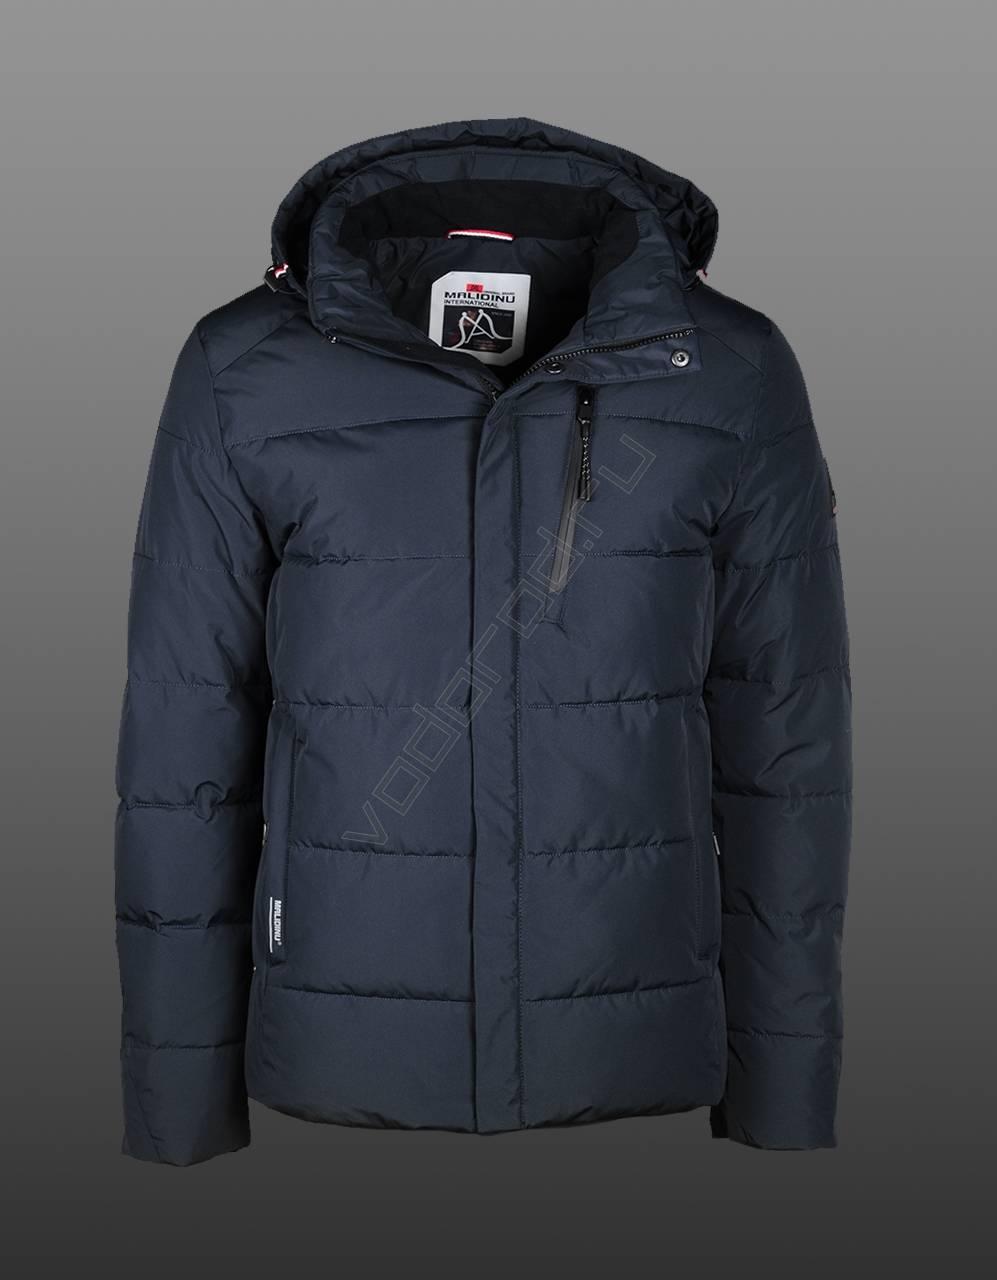 7d628732e7250 Зимняя куртка мужская купить оптом (цвет синий 203, кирпичный 802, темн.  синий 202), MALIDINU 19009 - VODOROD Россия